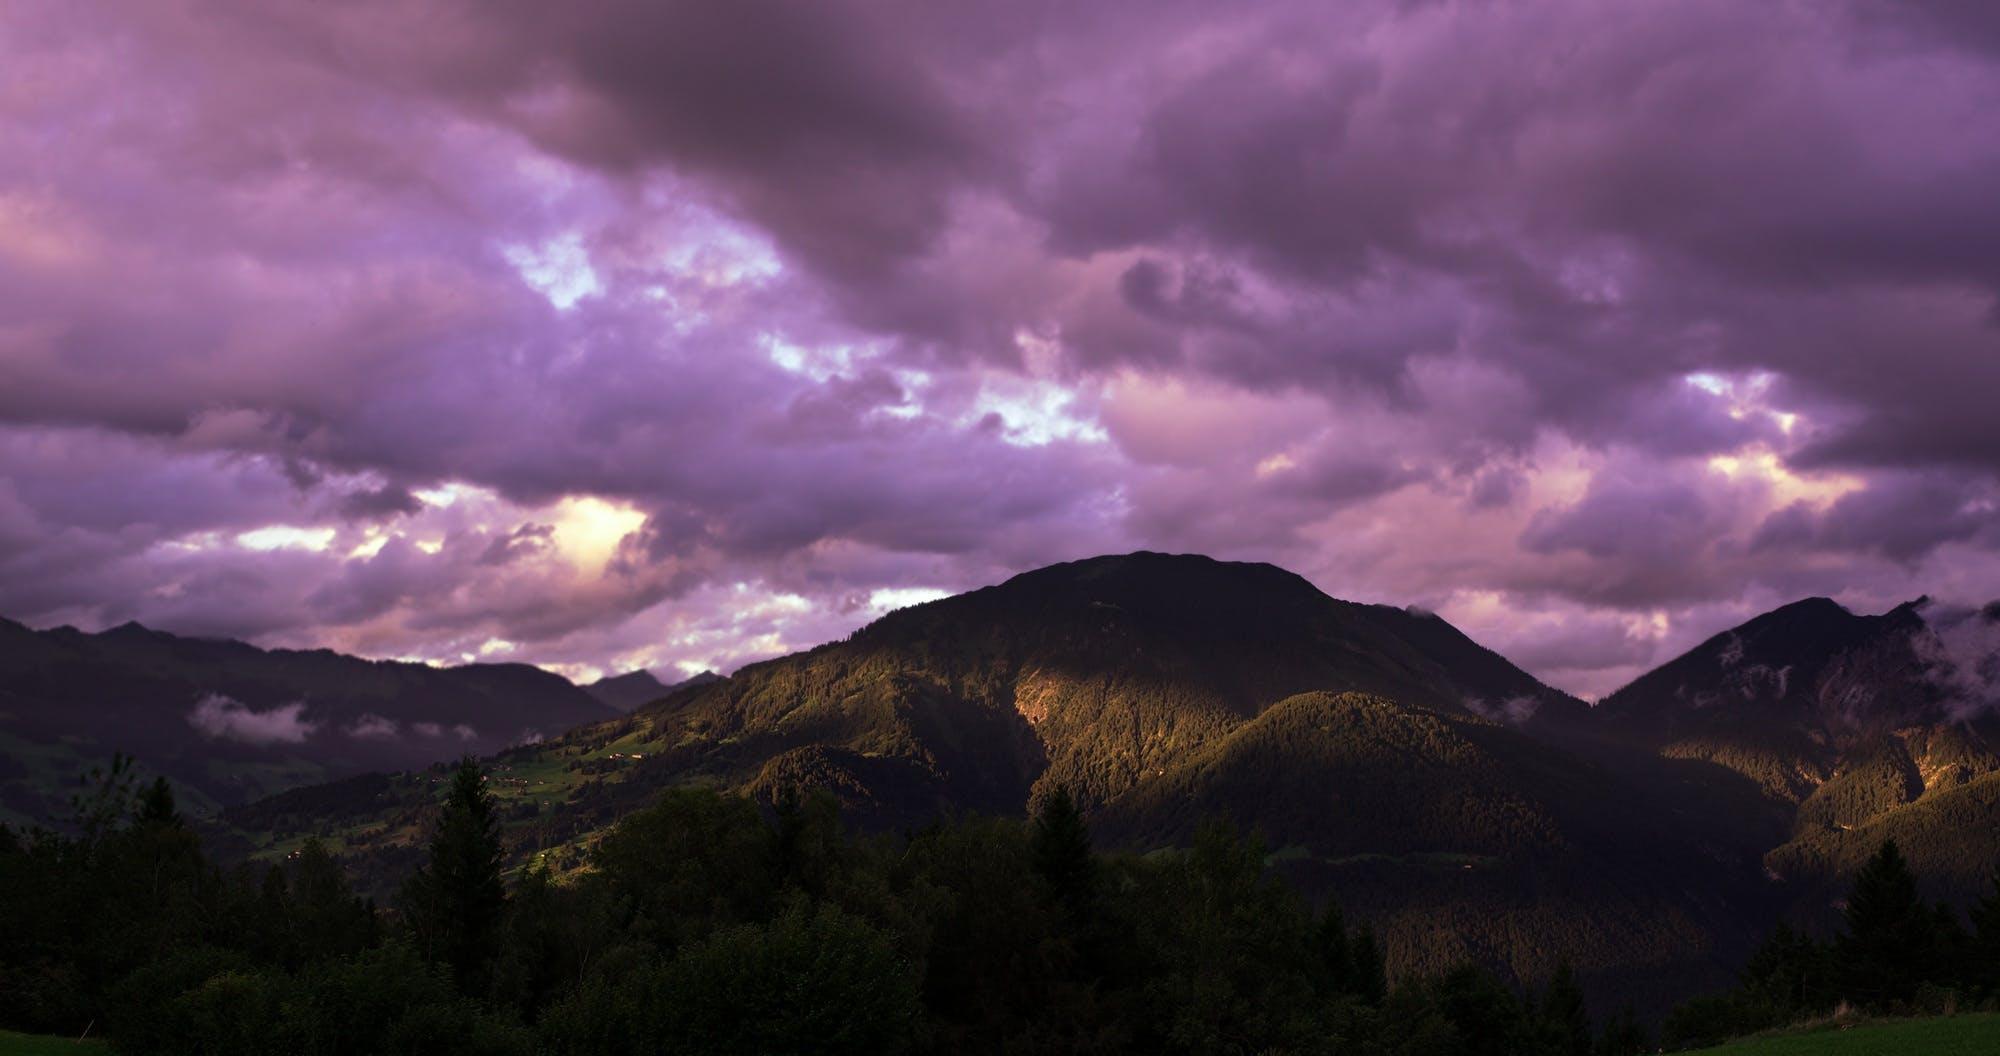 Kostenloses Stock Foto zu abend, bäume, berge, bewölkt